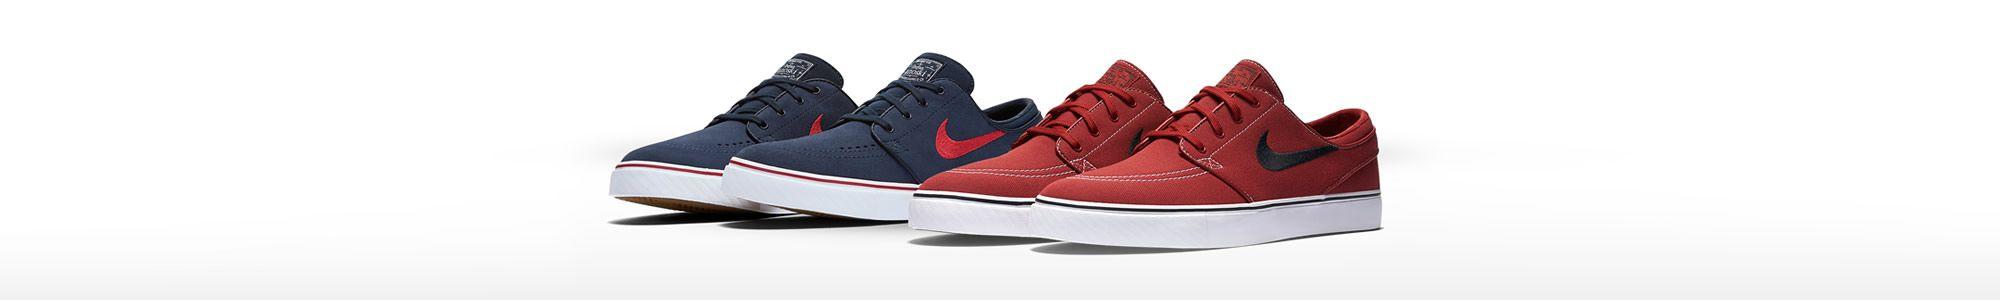 Nike Janoski Fiori